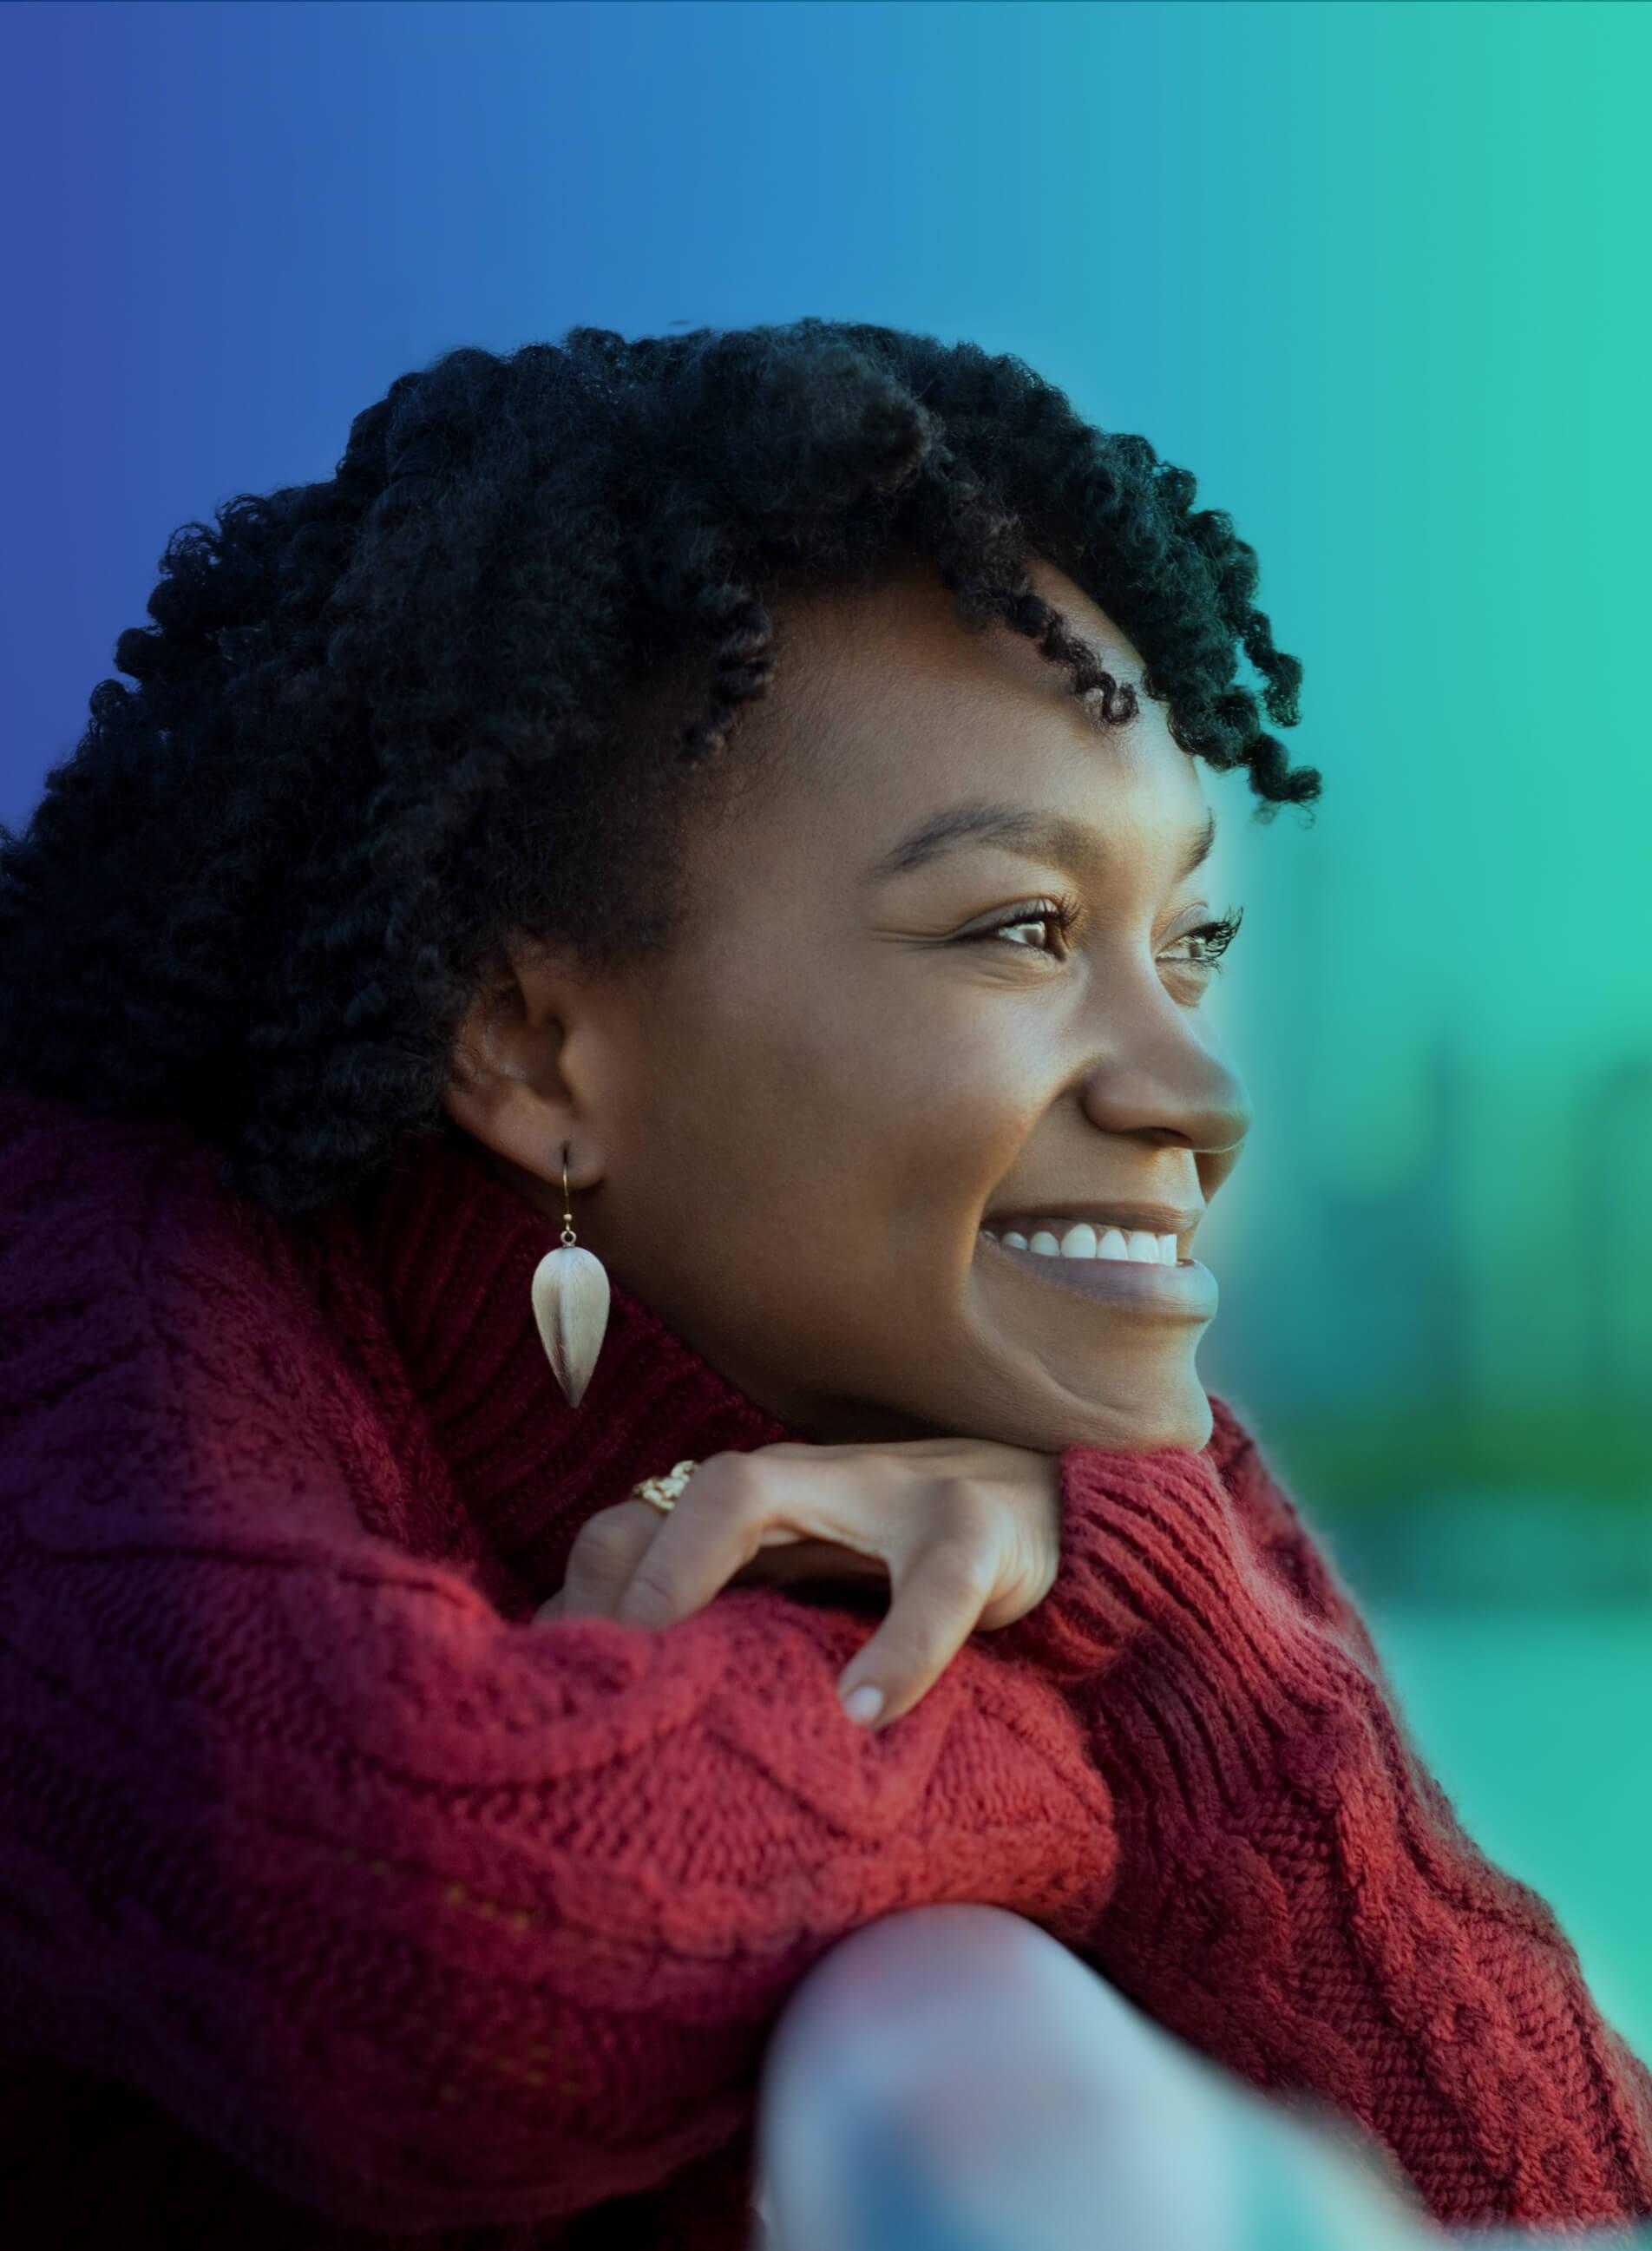 Smiling woman image